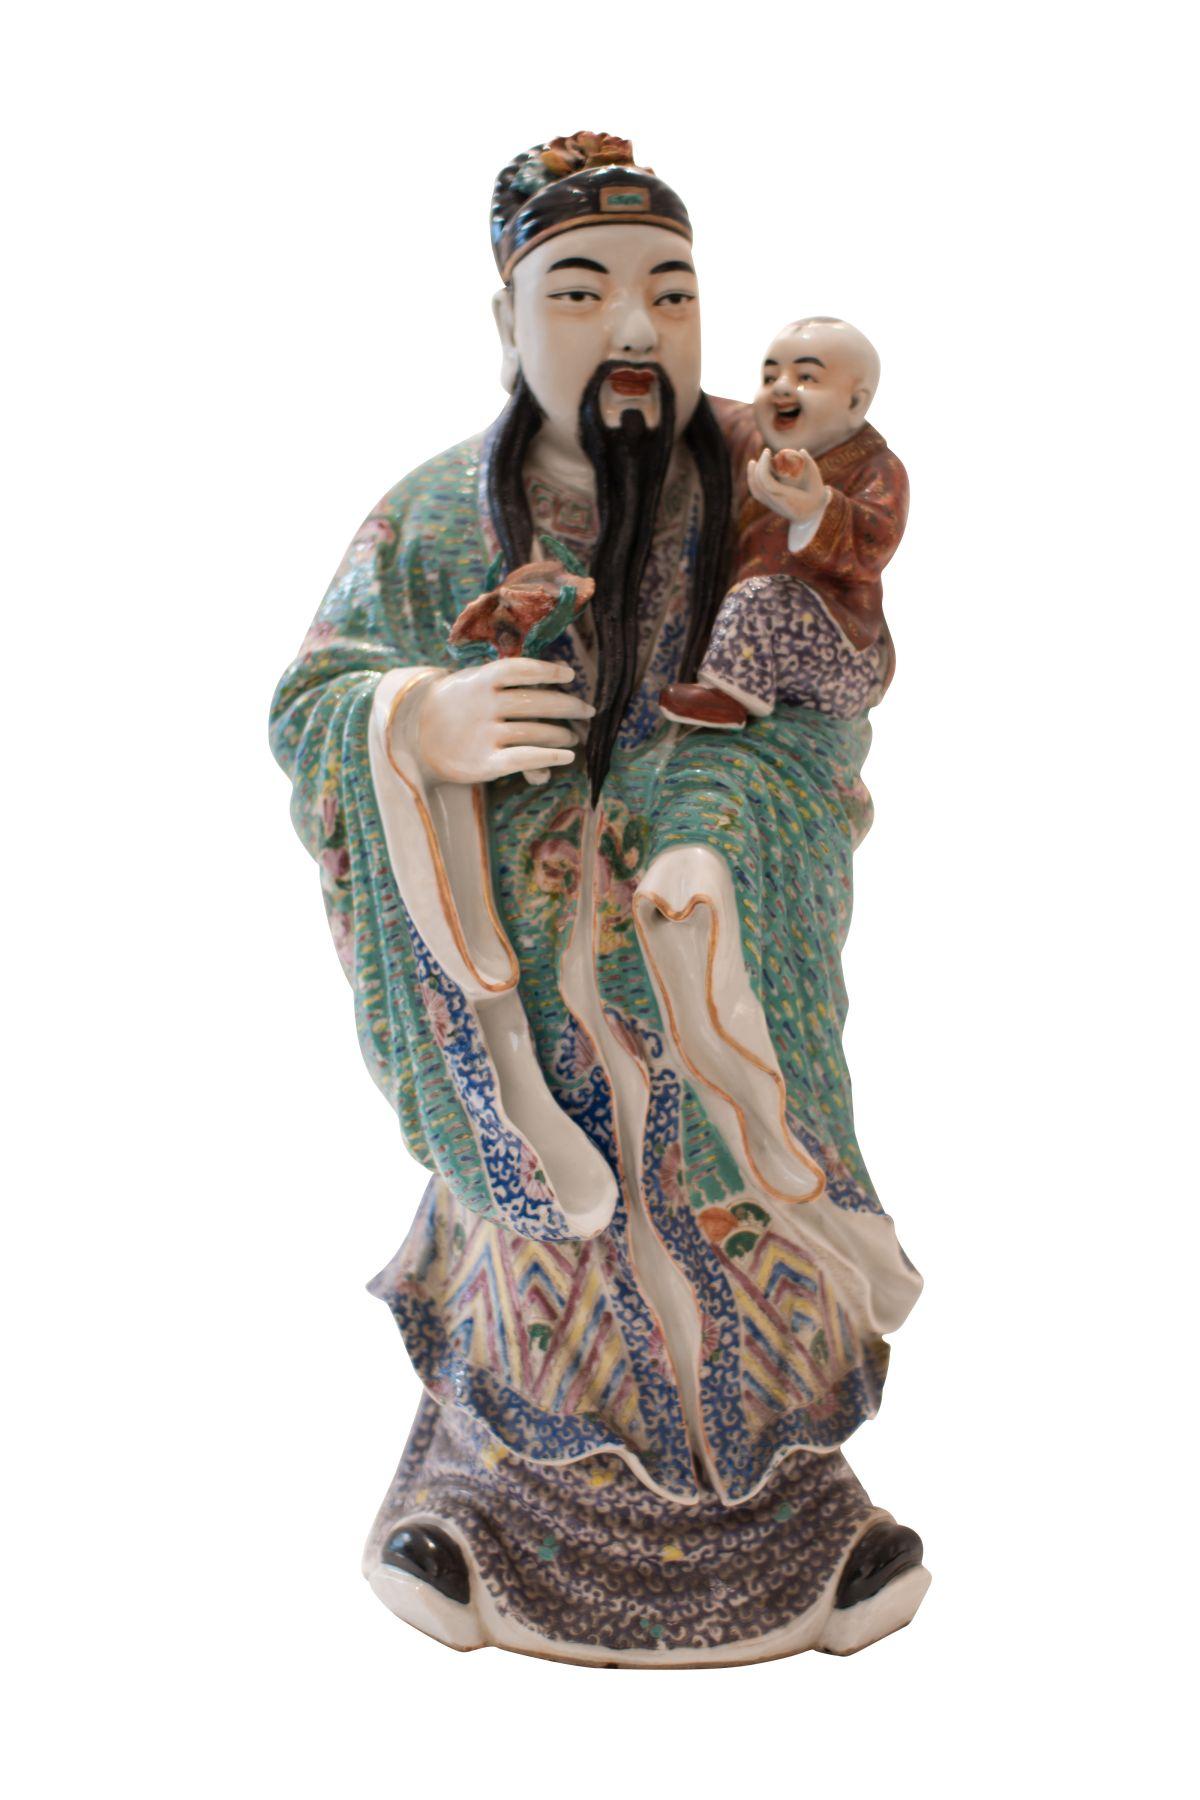 #56 Asian Priest with Child   Asiatischer Priester mit Kind Image